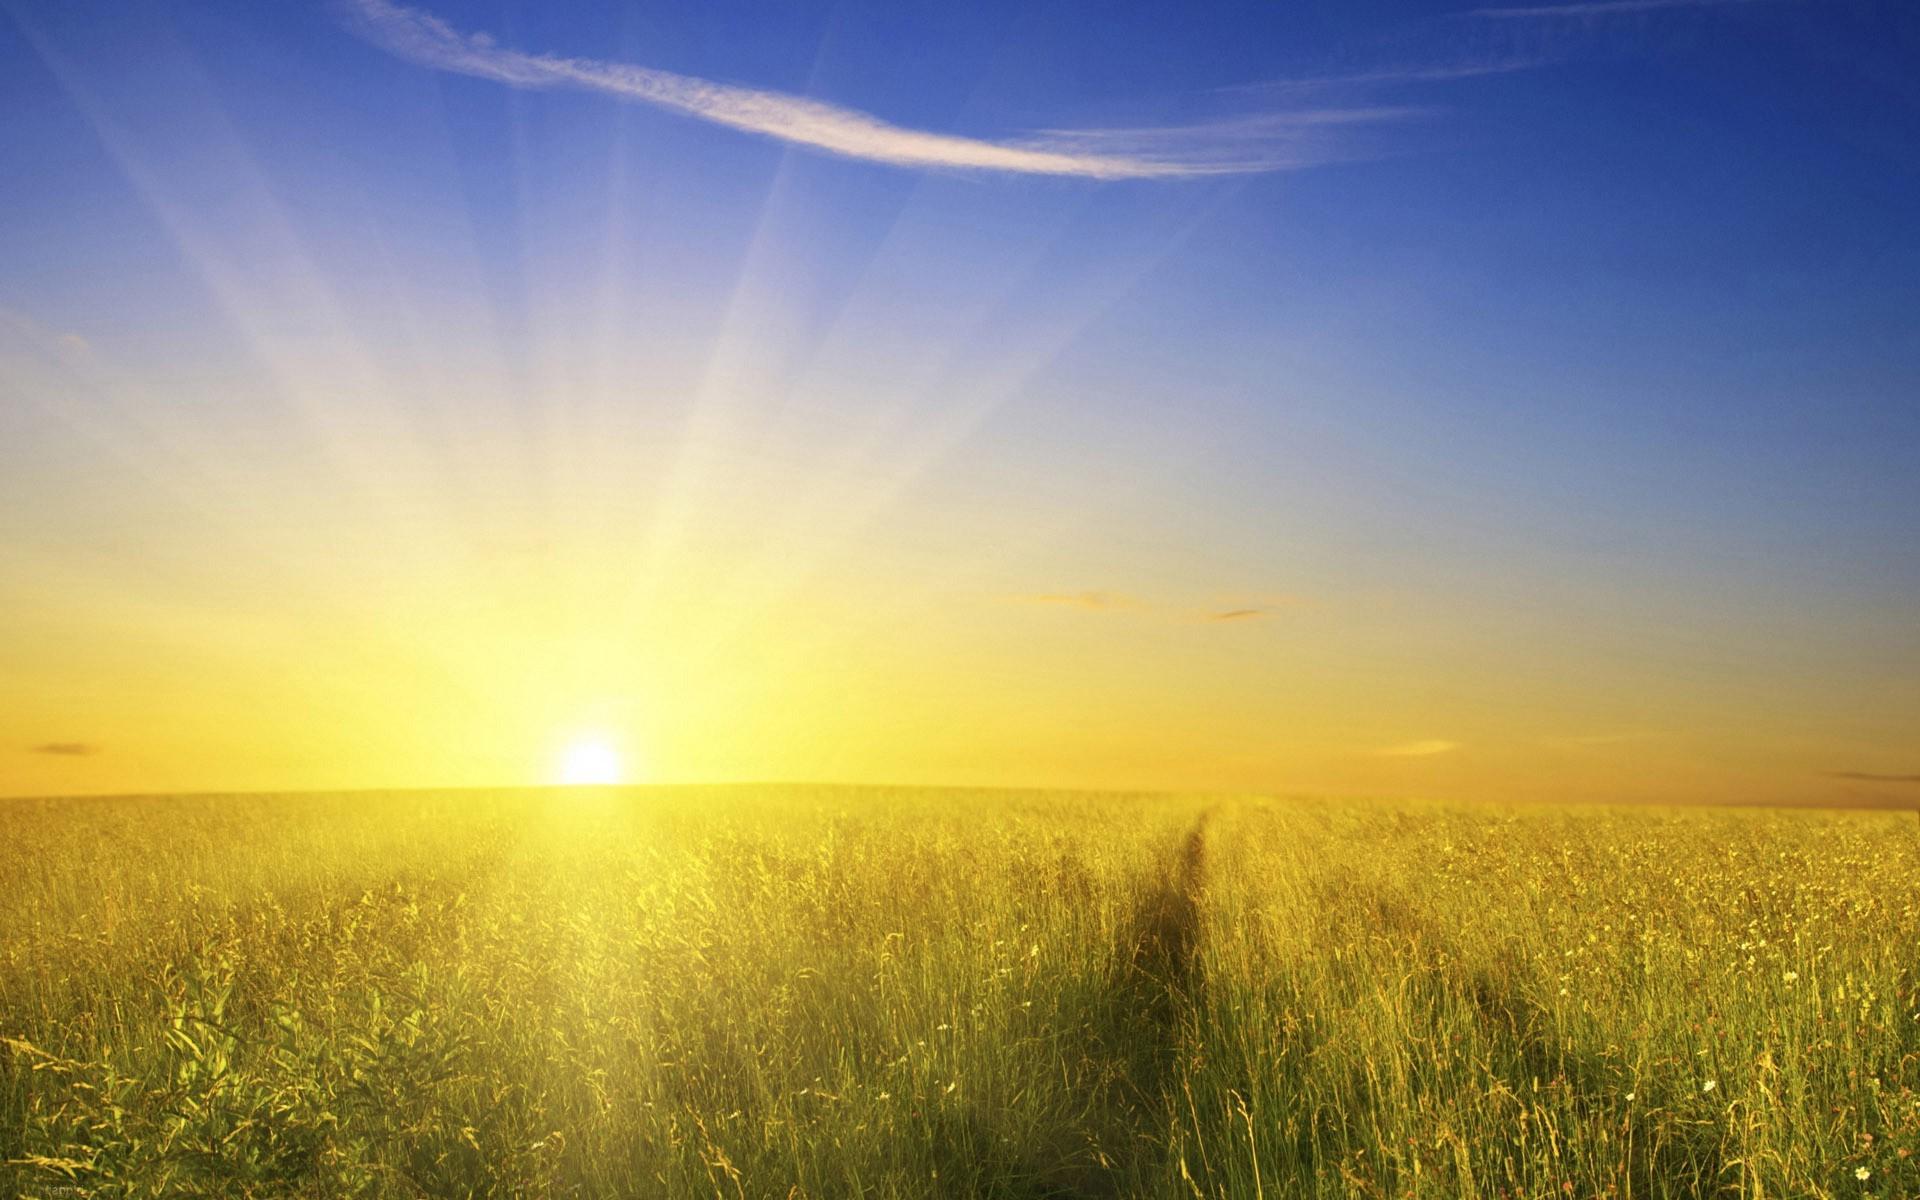 sunlight-landscape-food-sunset-grass-sky-field-sunrise-evening-morning-Sun-horizon-dusk-Rapese...jpg